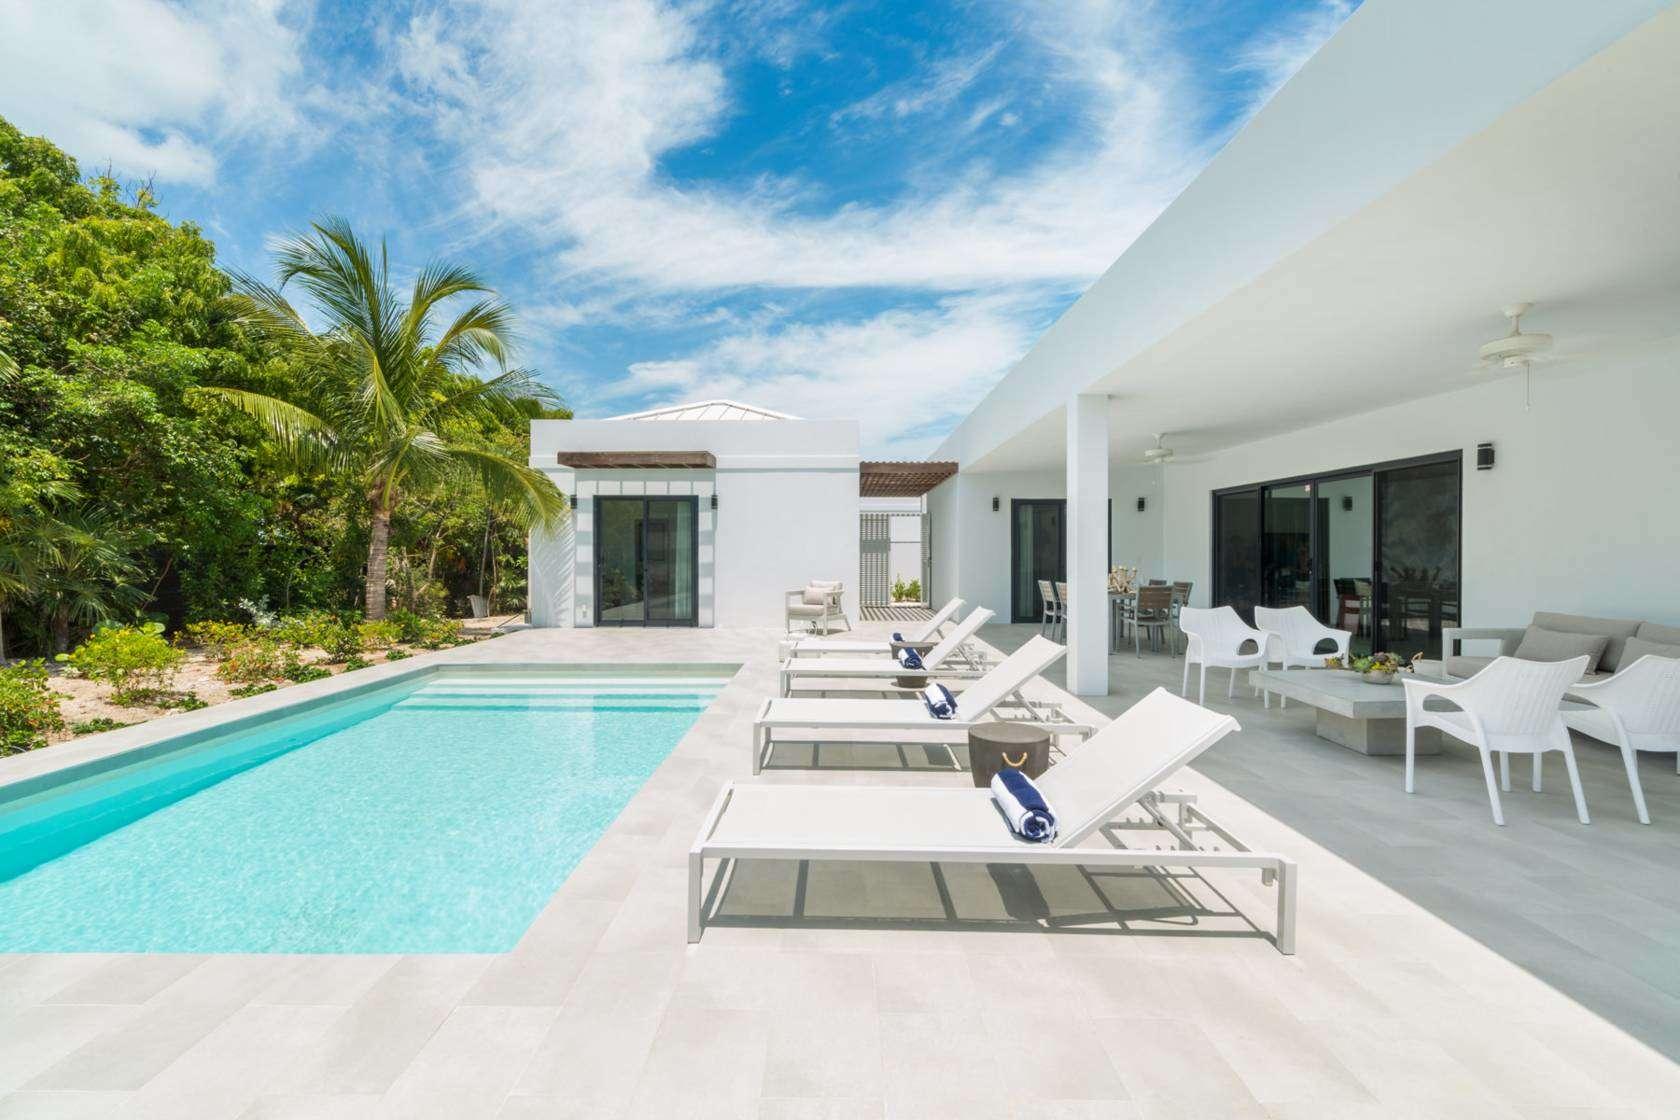 - Tradewinds Villa - Image 1/20